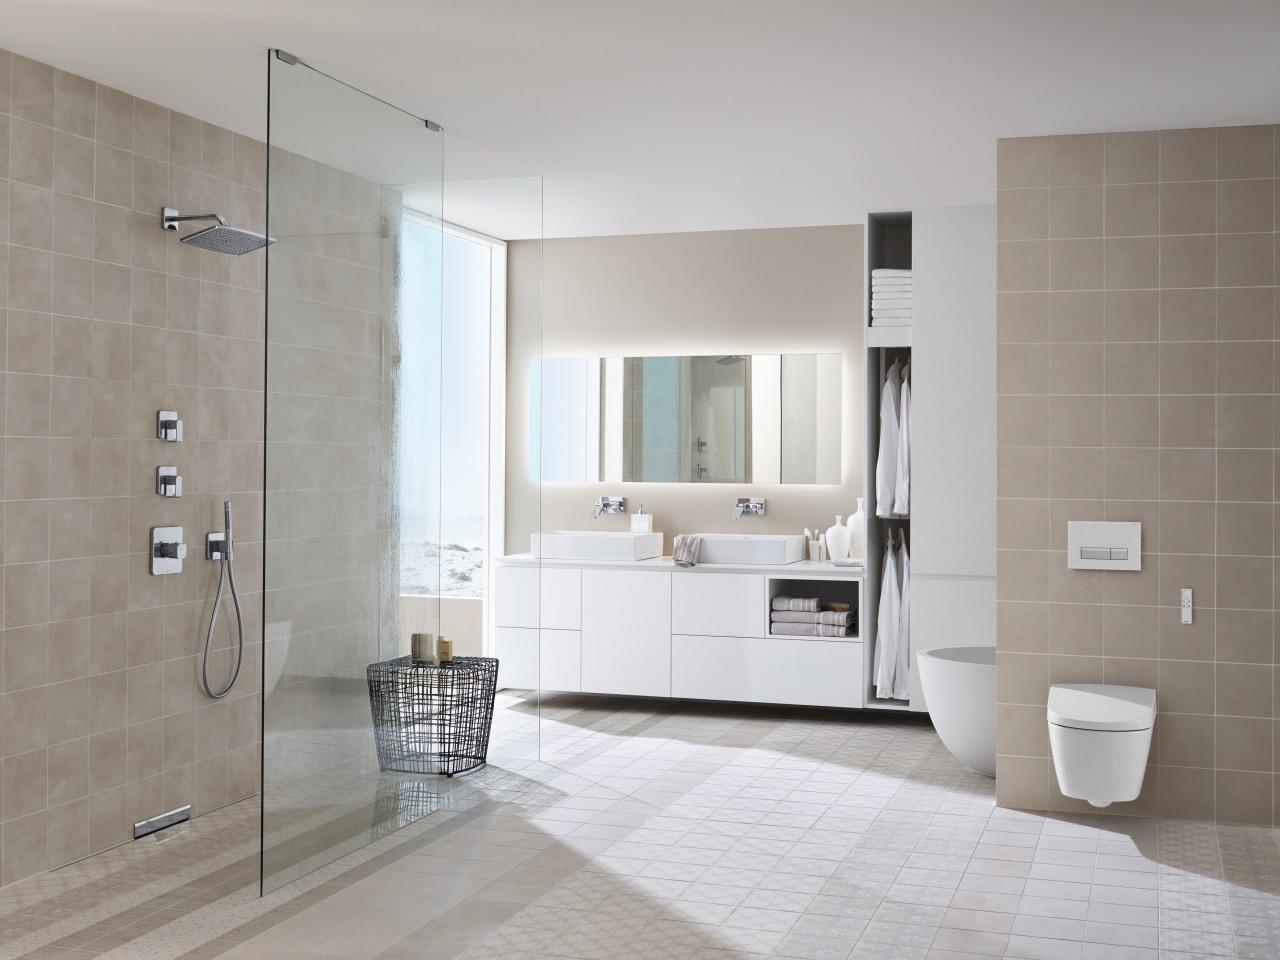 Wall-hung vanities and toilets, we rooms and Geberit bathroom, bathroom accessory, bathroom cabinet, floor, flooring, interior design, plumbing fixture, room, sink, tile, wall, wood flooring, gray